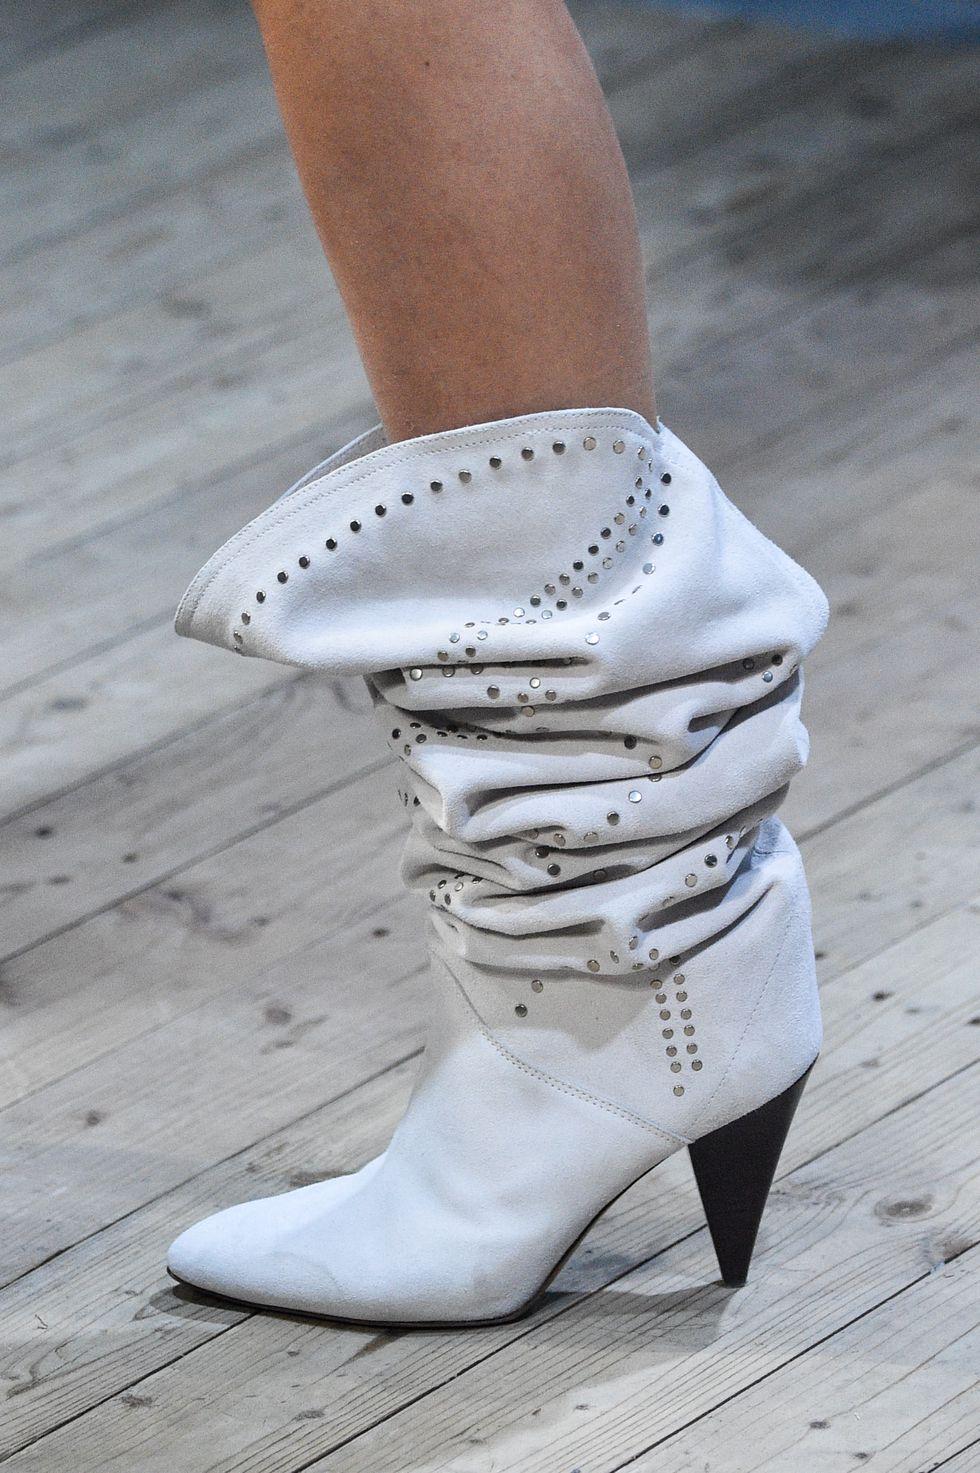 8495bd184e Δεν υπάρχει περίπτωση να μην αποκτήσω φέτος ένα ζευγάρι slouchy boots.  Μπορεί να τις αφήσω για τις αγορές που κάνω στις αρχές φθινοπώρου αλλά θα  τις αγοράσω ...